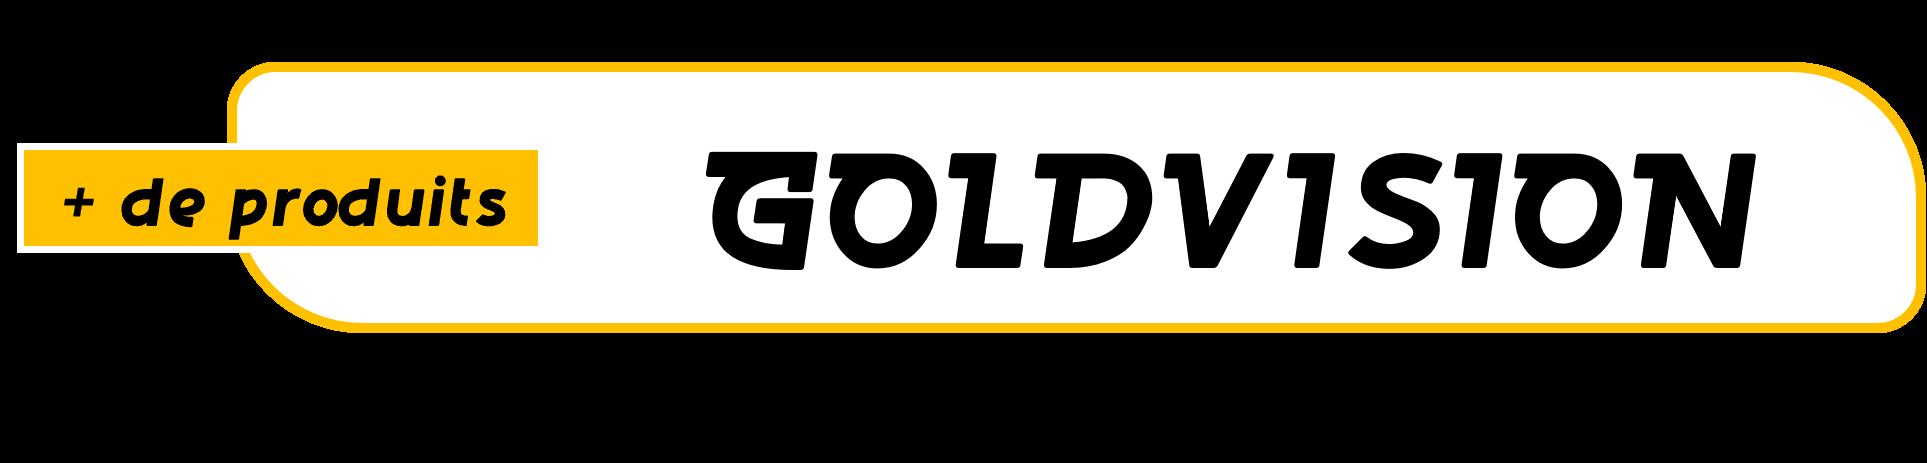 GOLDVISION